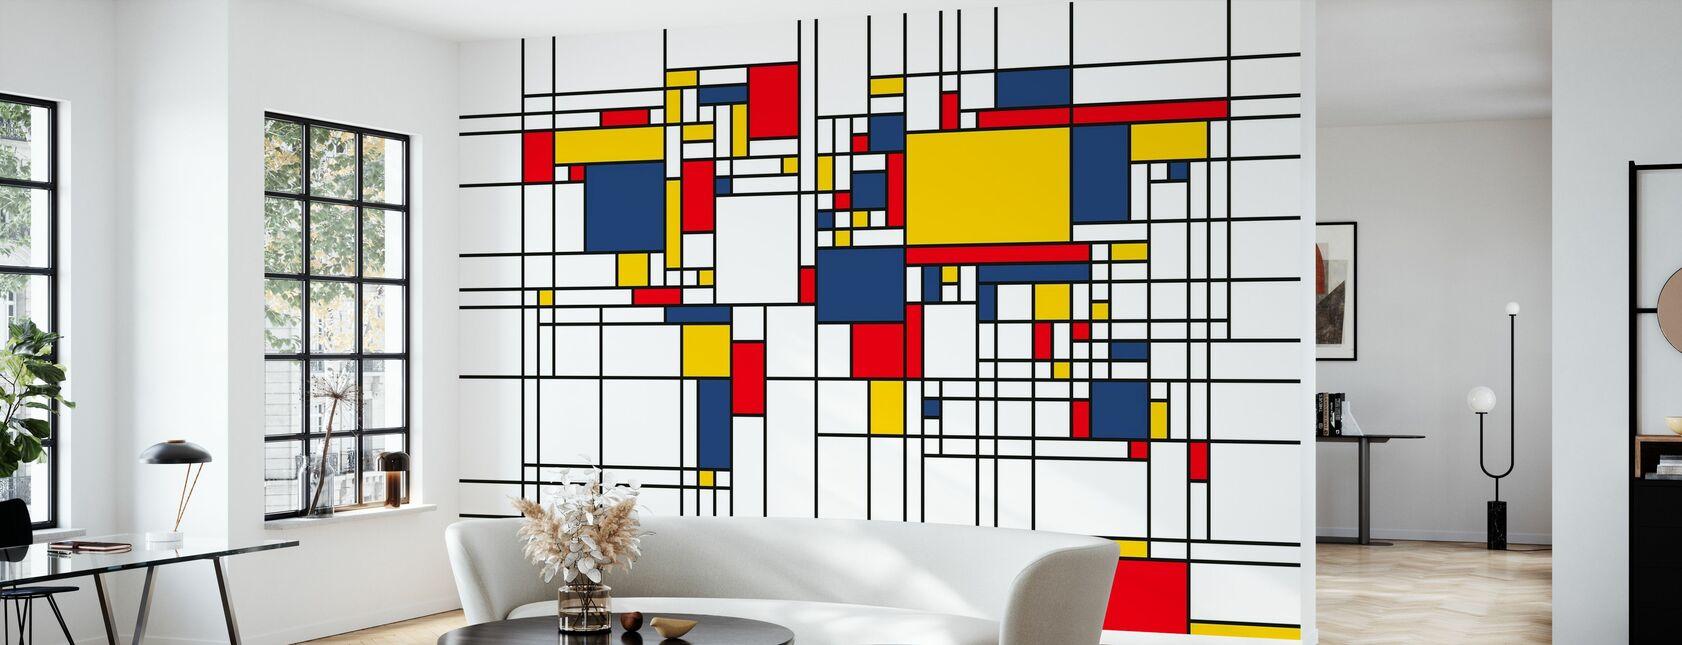 Piet Mondrian Style World Map - Wallpaper - Living Room